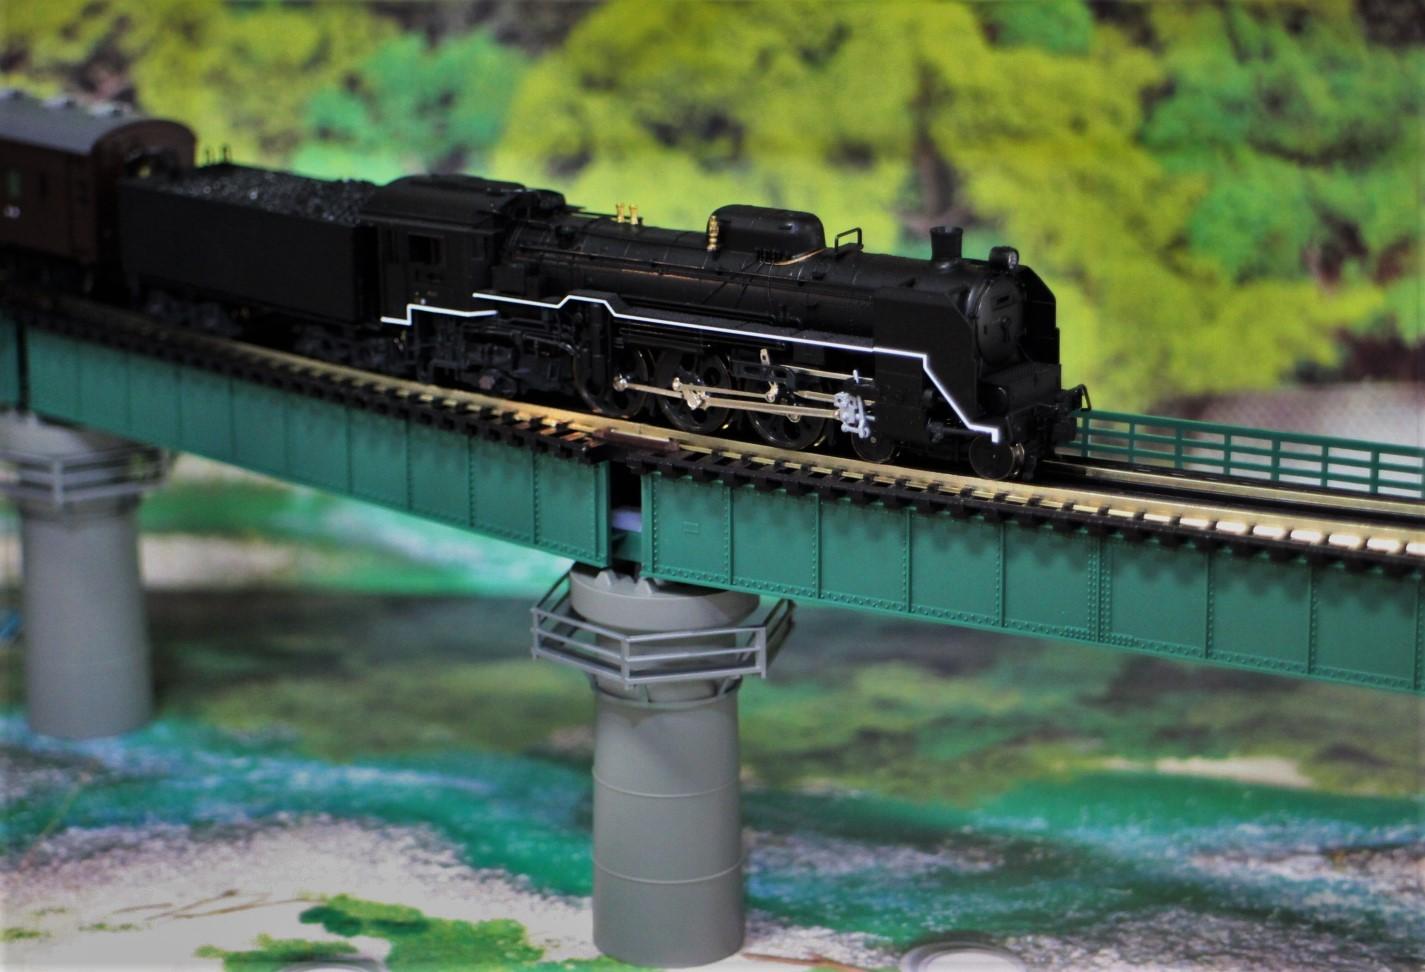 KATO のカーブ鉄橋セットを使い楽しんでみる!_a0149148_10491061.jpg